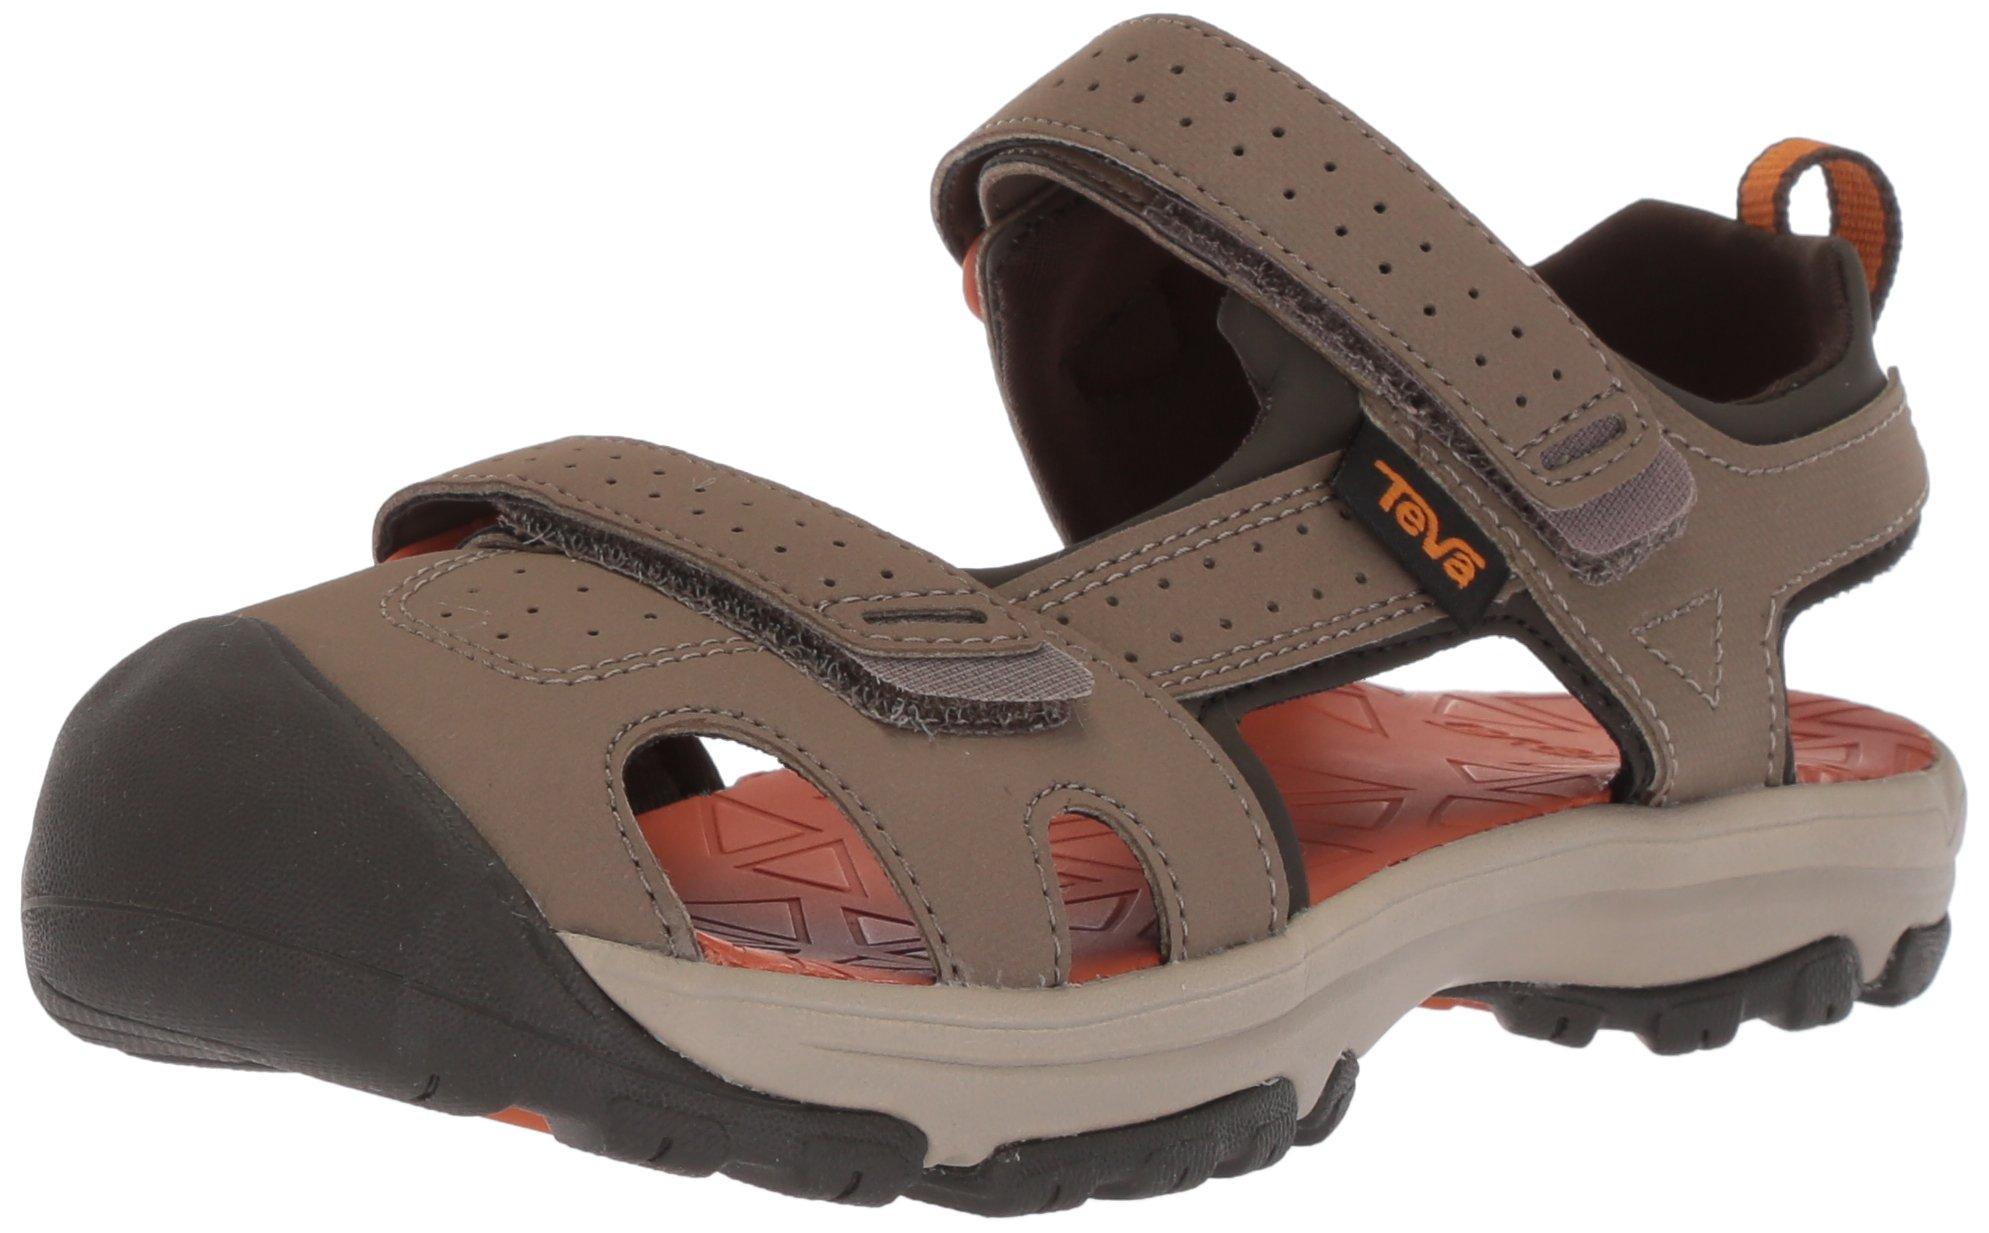 Teva Boys' K Hurricane Toe PRO Sport Sandal, Walnut, 3 M US Little Kid